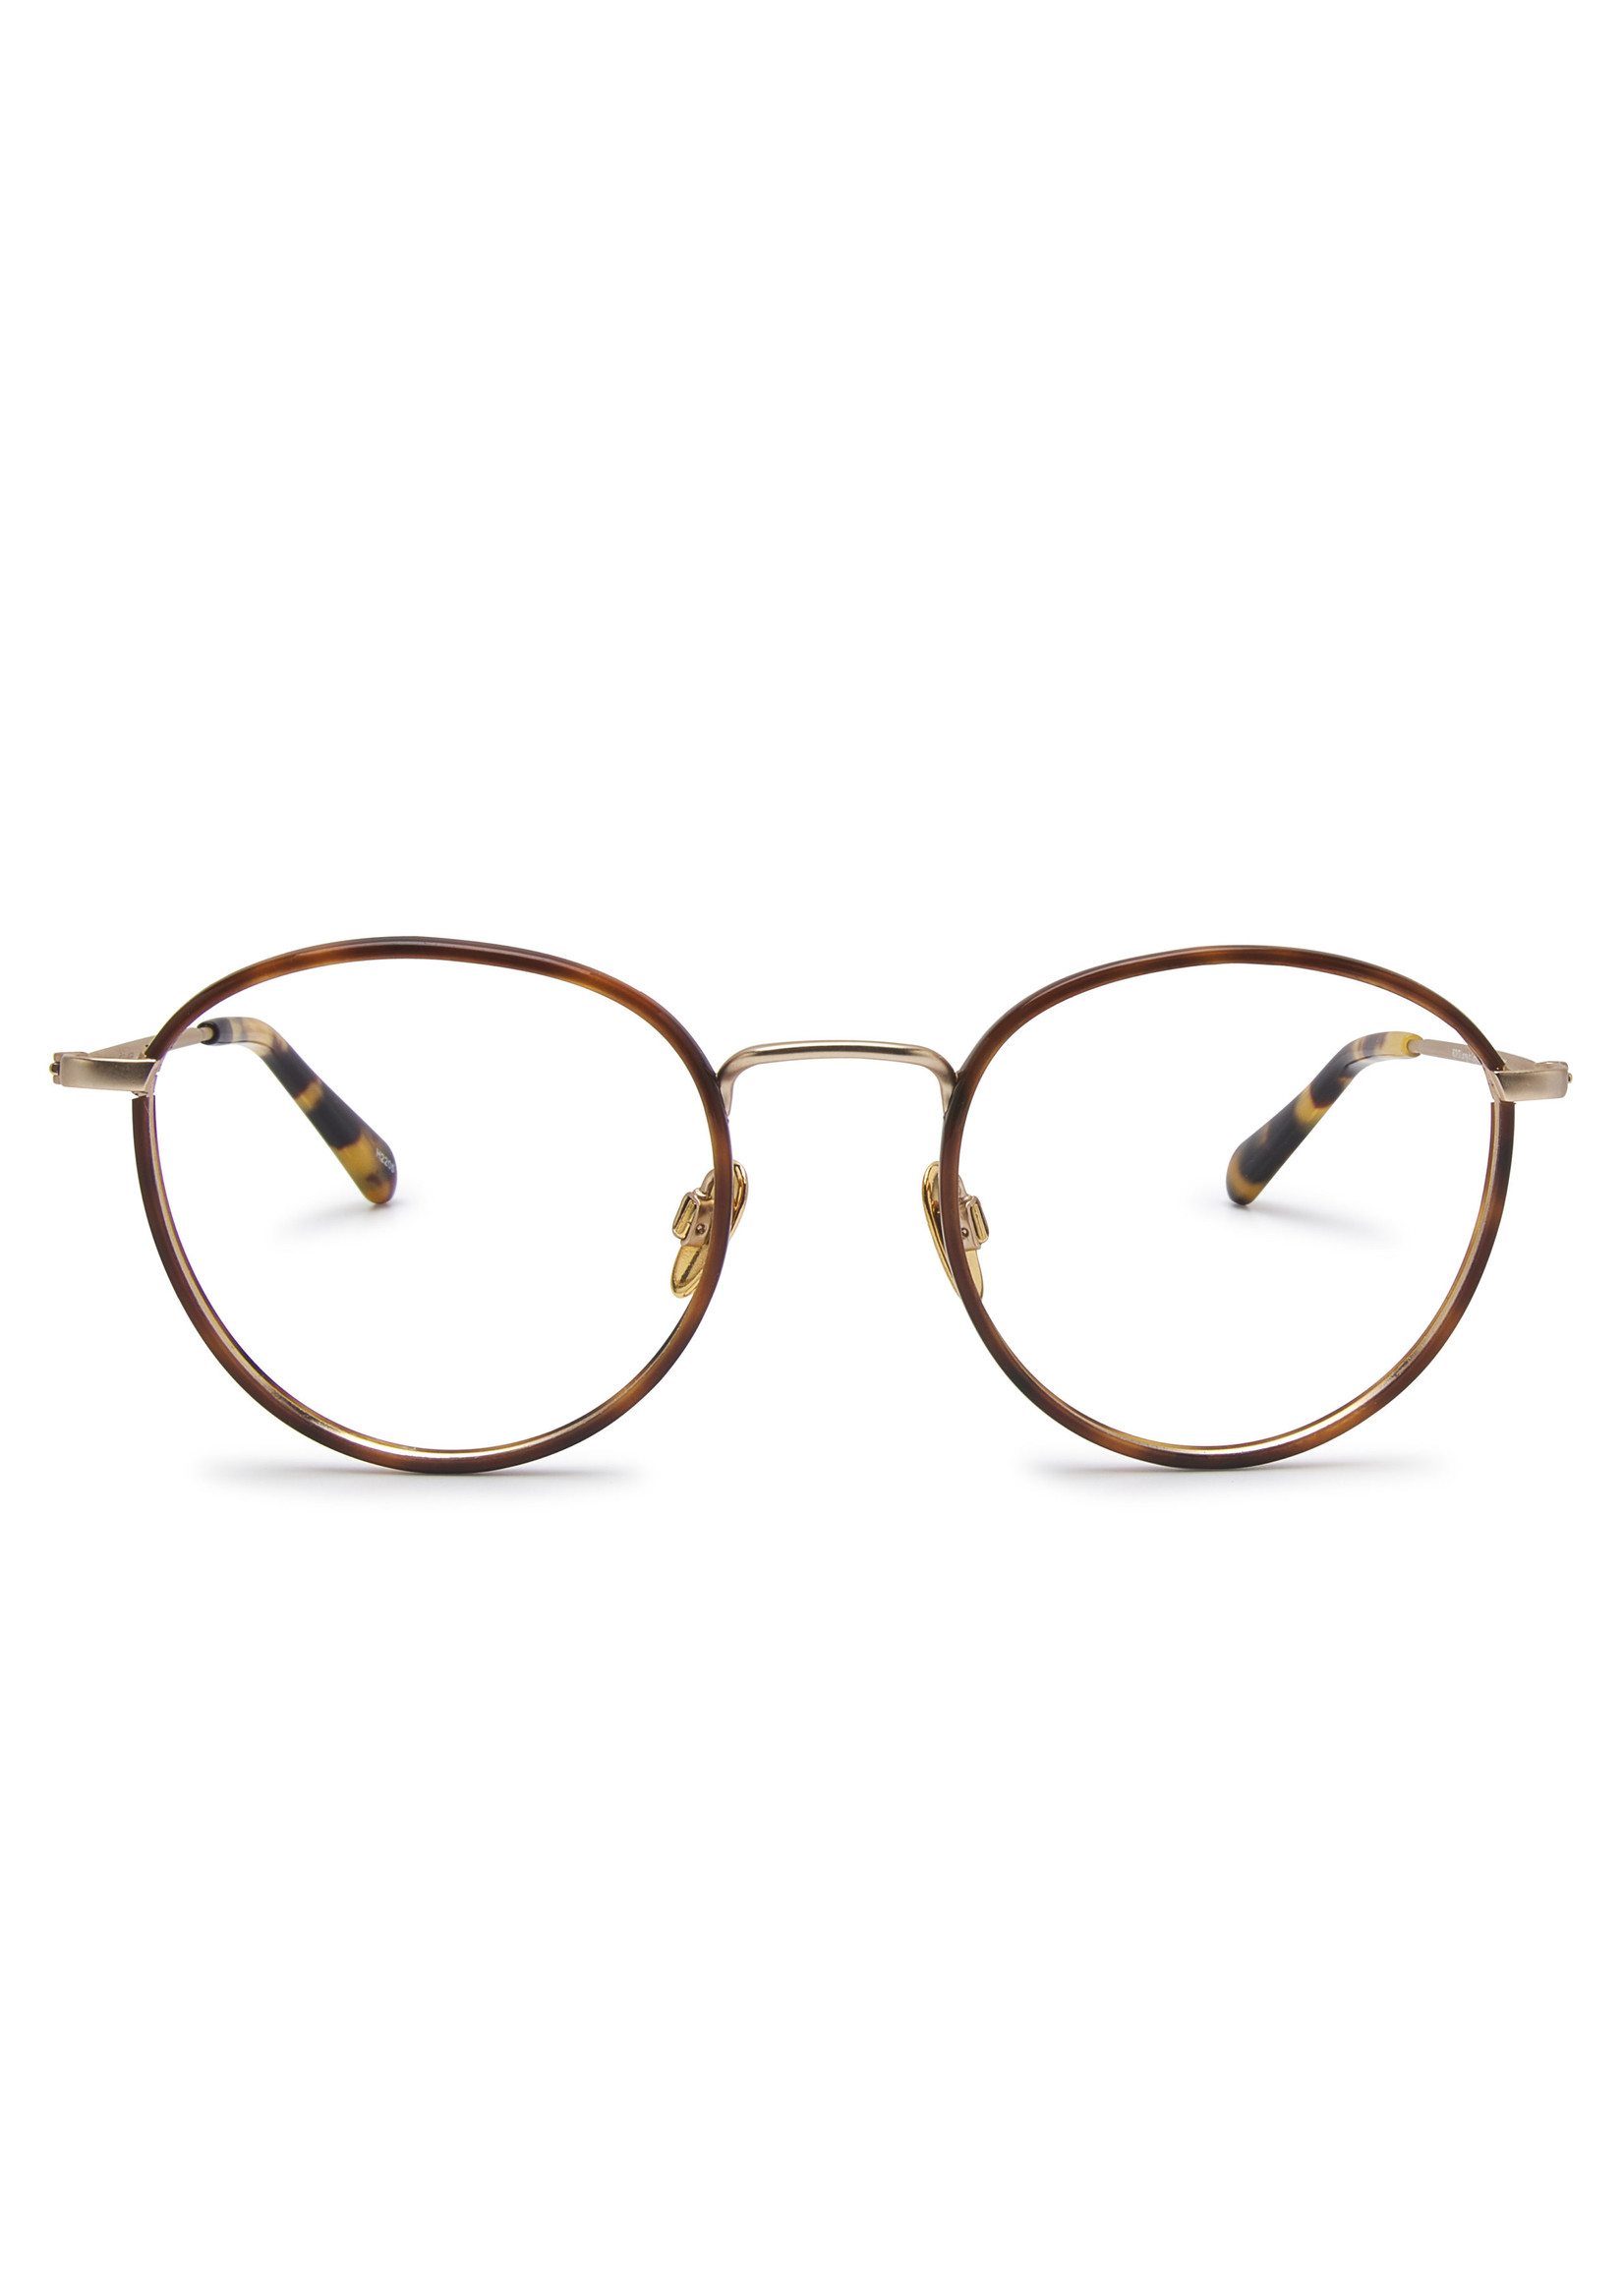 Heyelander Design Brillen  Heyelander Desigh Leesbril Boyd Titanium in ligh gold  windsor